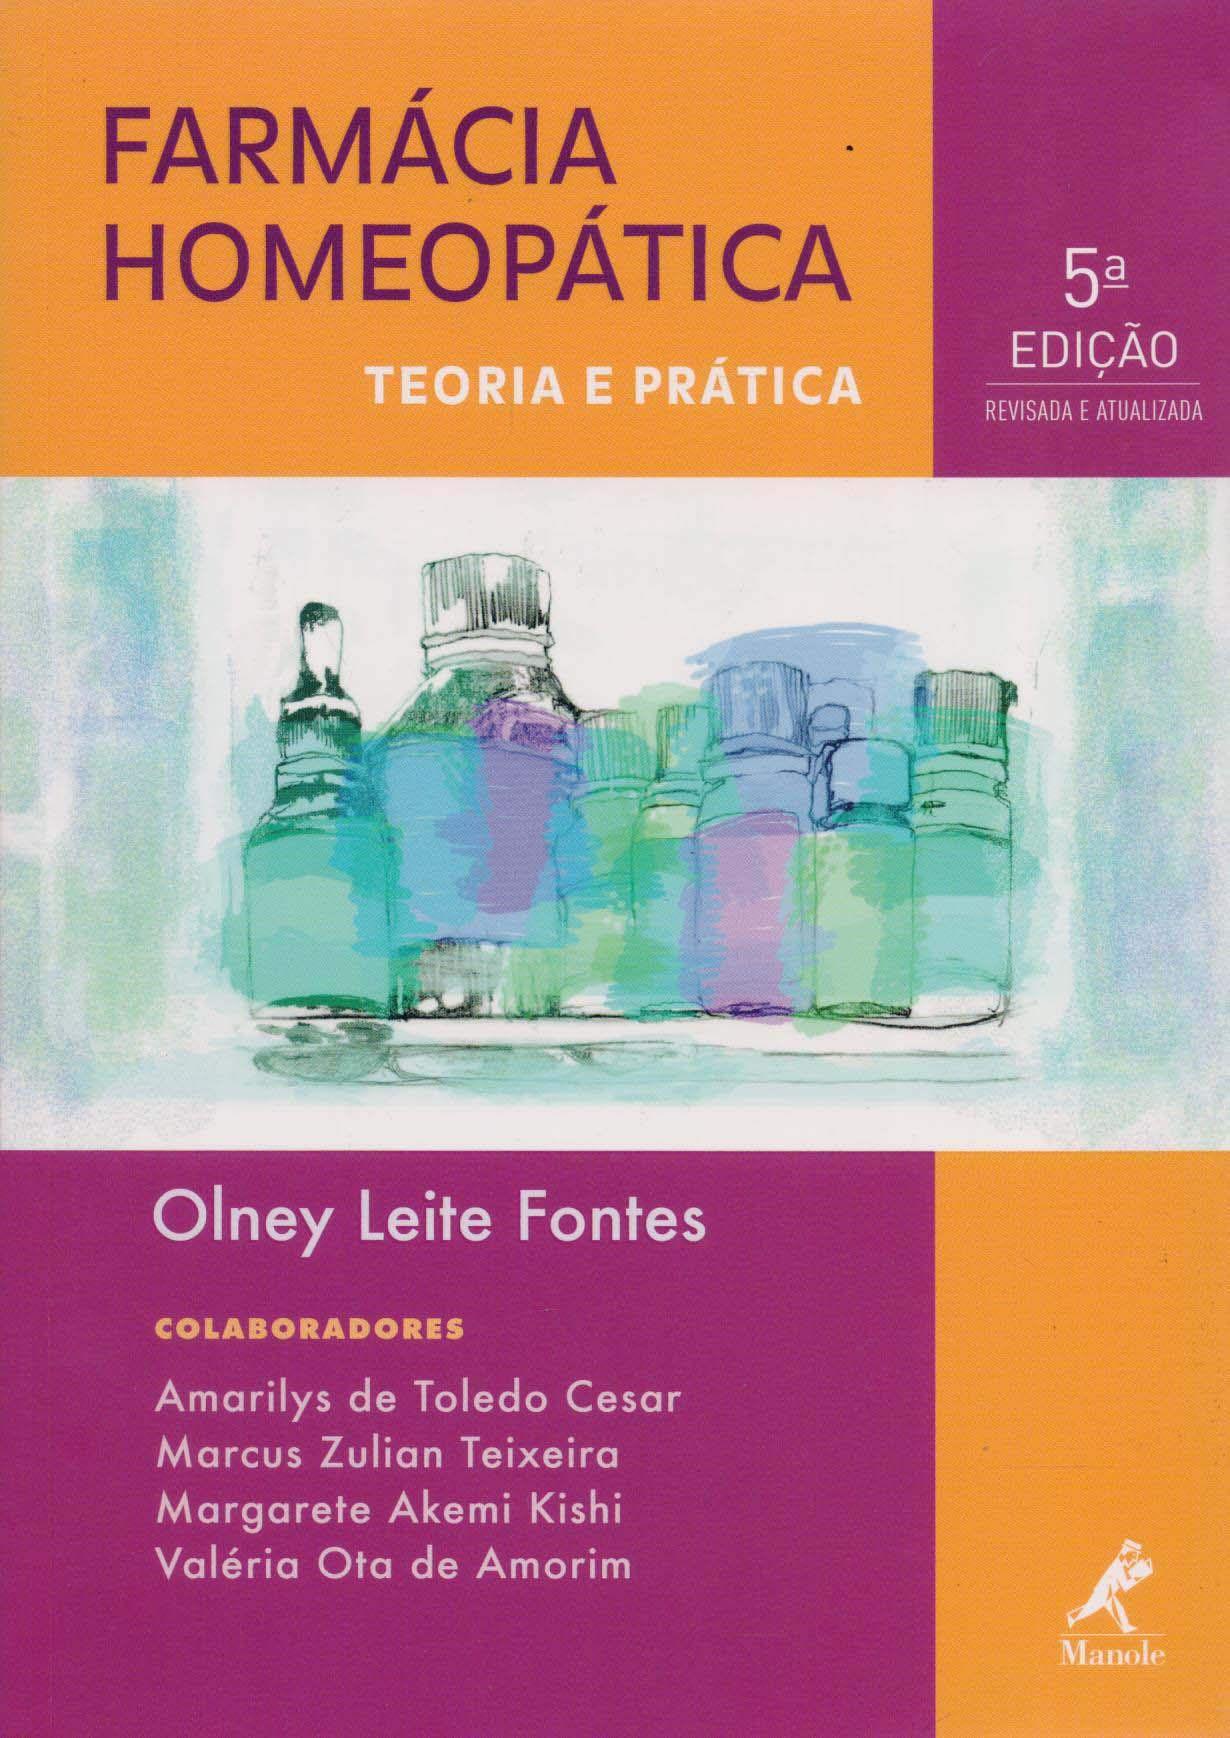 Livro Farmácia Homeopática  - LIVRARIA ODONTOMEDI